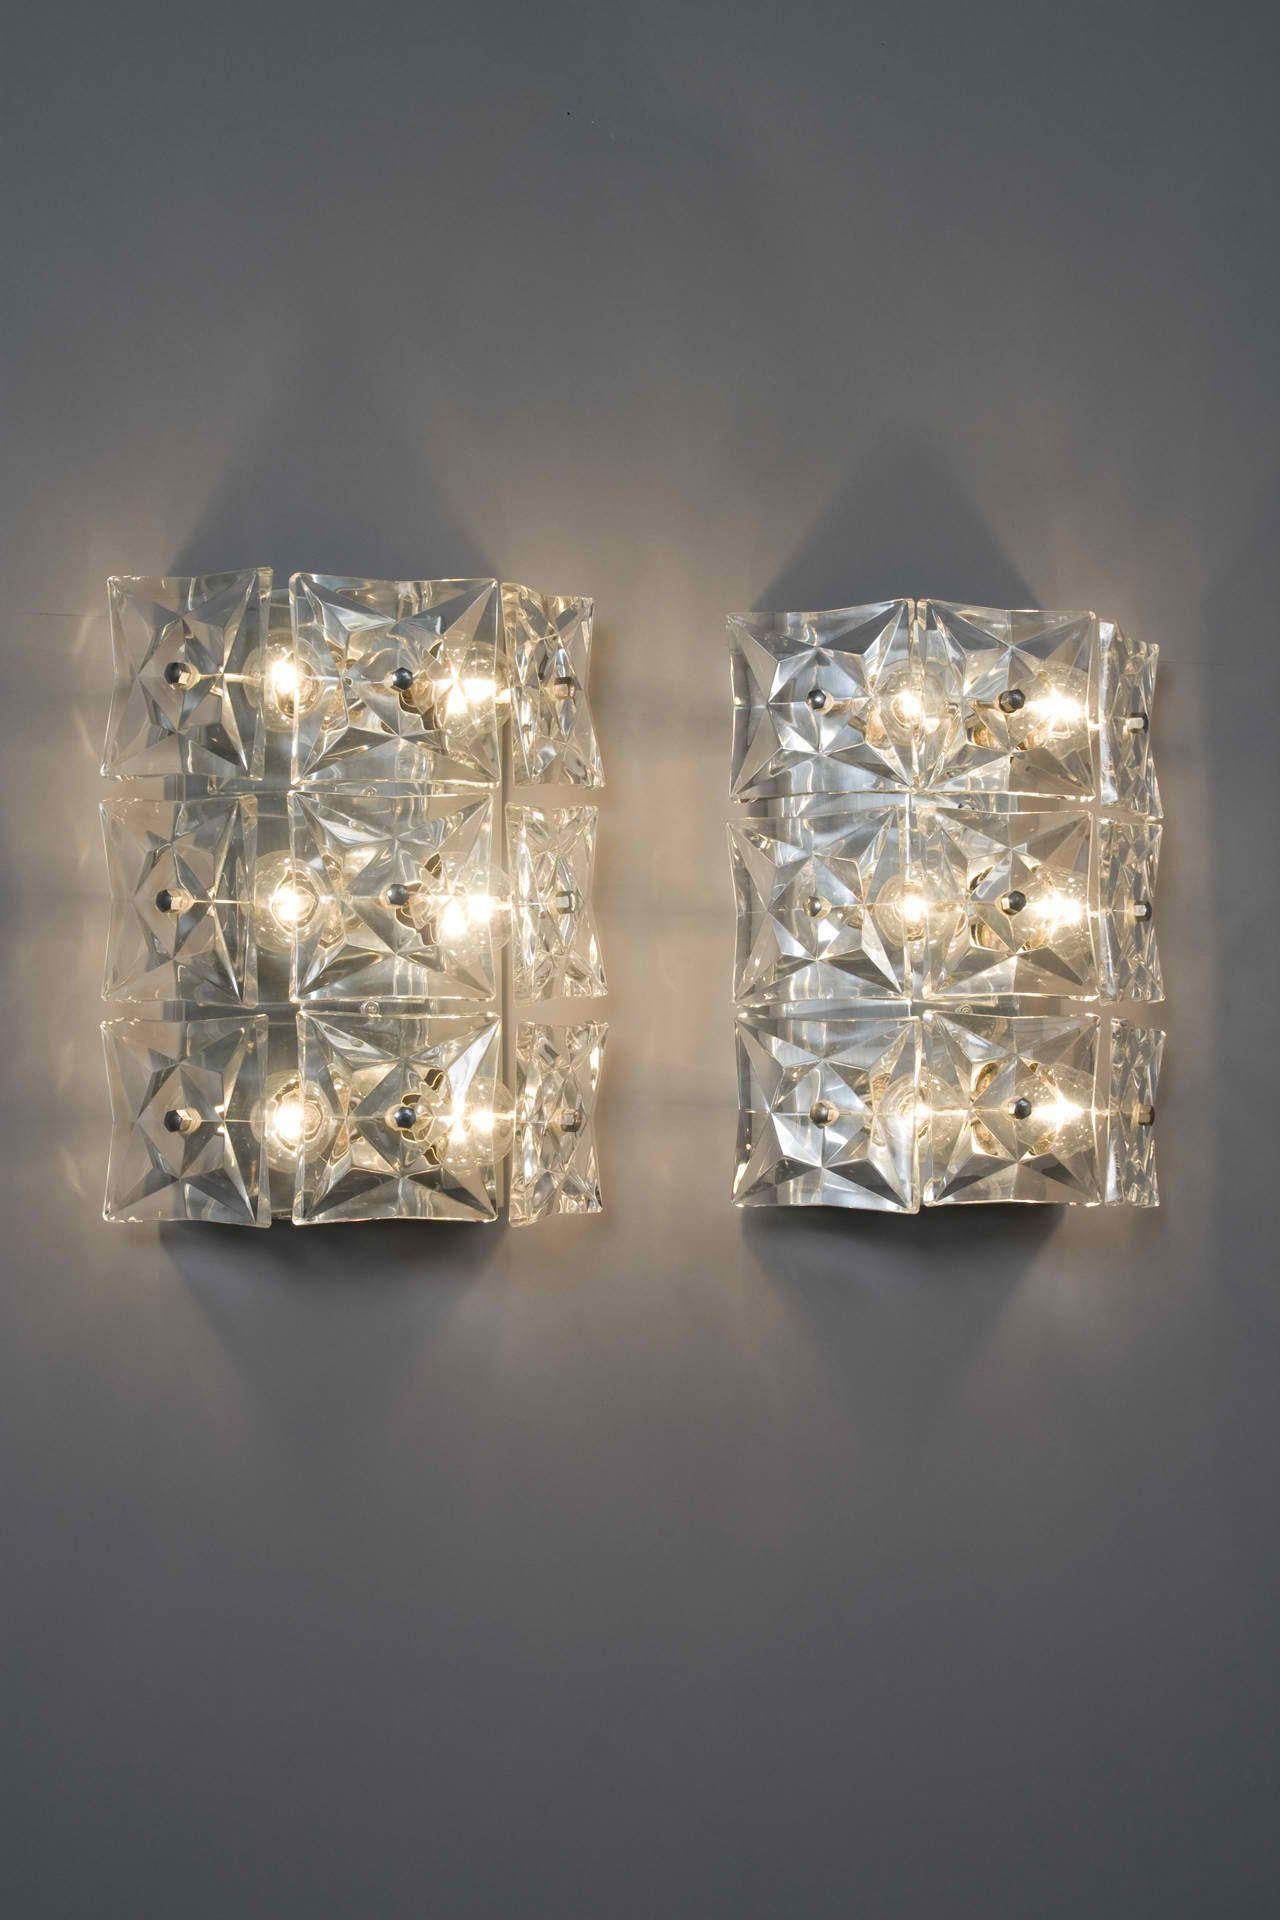 Bathroom Wall Sconces Ebay crystal sconces | home furniture | pinterest | crystal sconce & Simple 50+ Bathroom Wall Sconces Ebay Decorating Inspiration Of ... azcodes.com